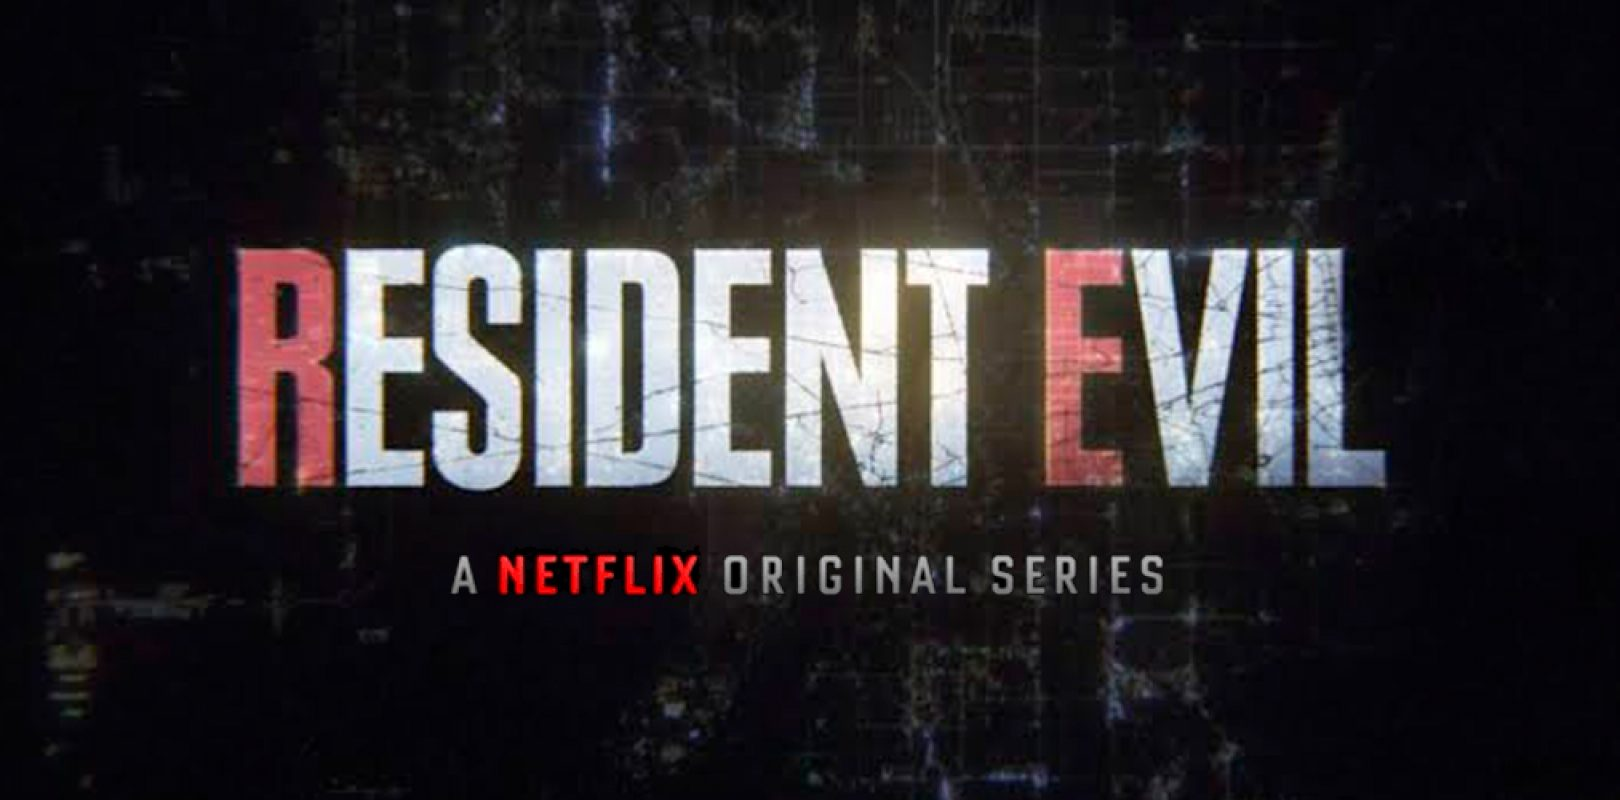 La serie Resident Evil de Netflix iniciará rodaje en junio de 2020